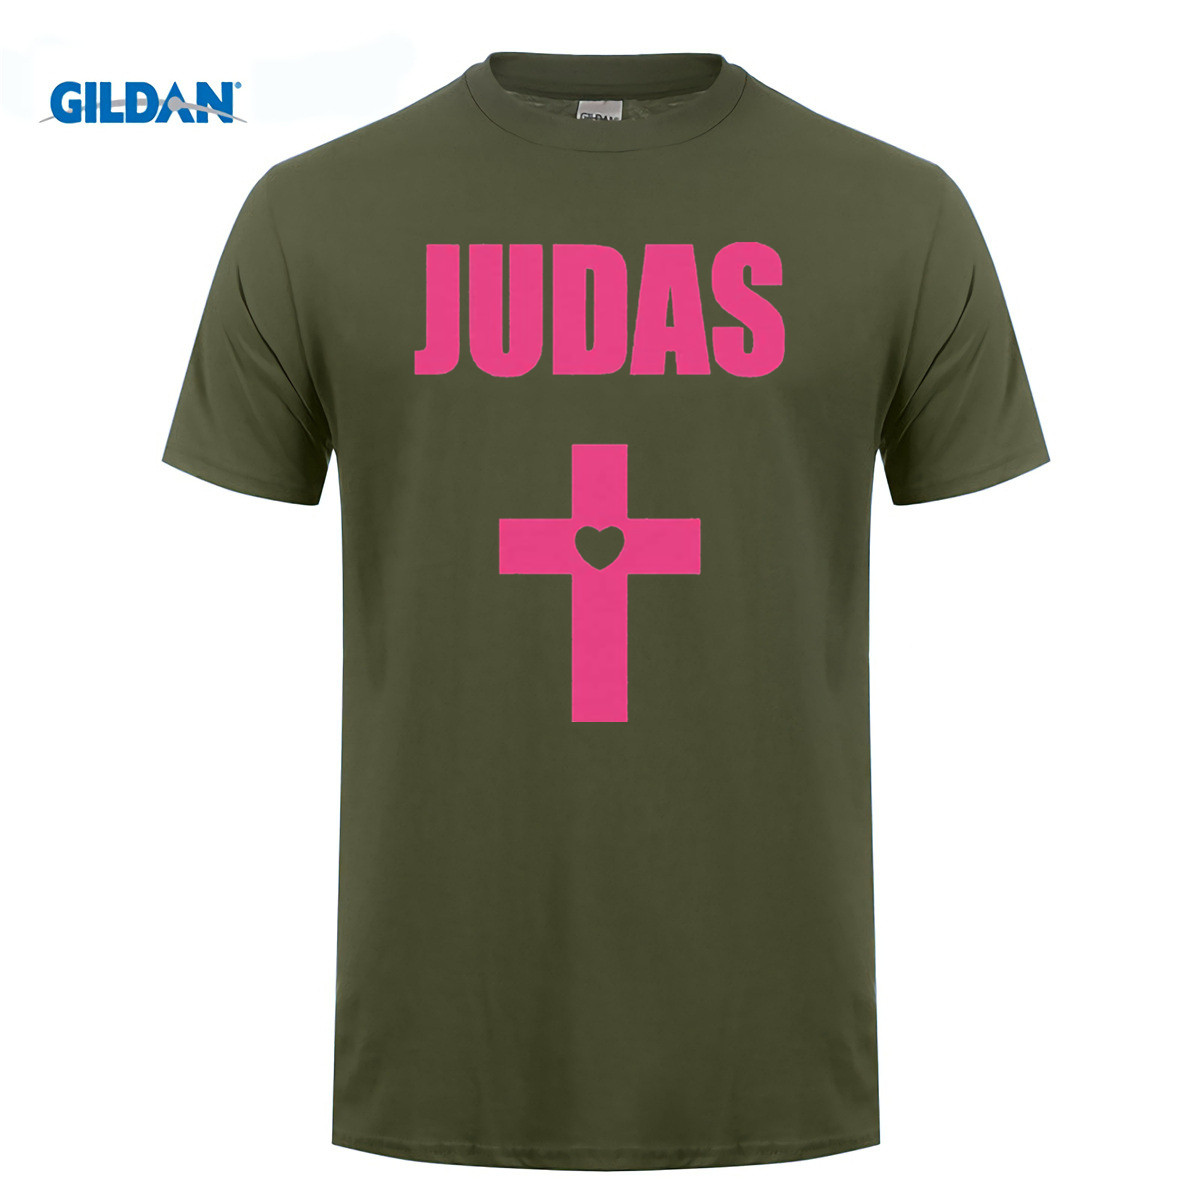 GILDAN cotton O-neck printing fashion T shirt Lady Gaga T Shirt Judas Cross Born This Way